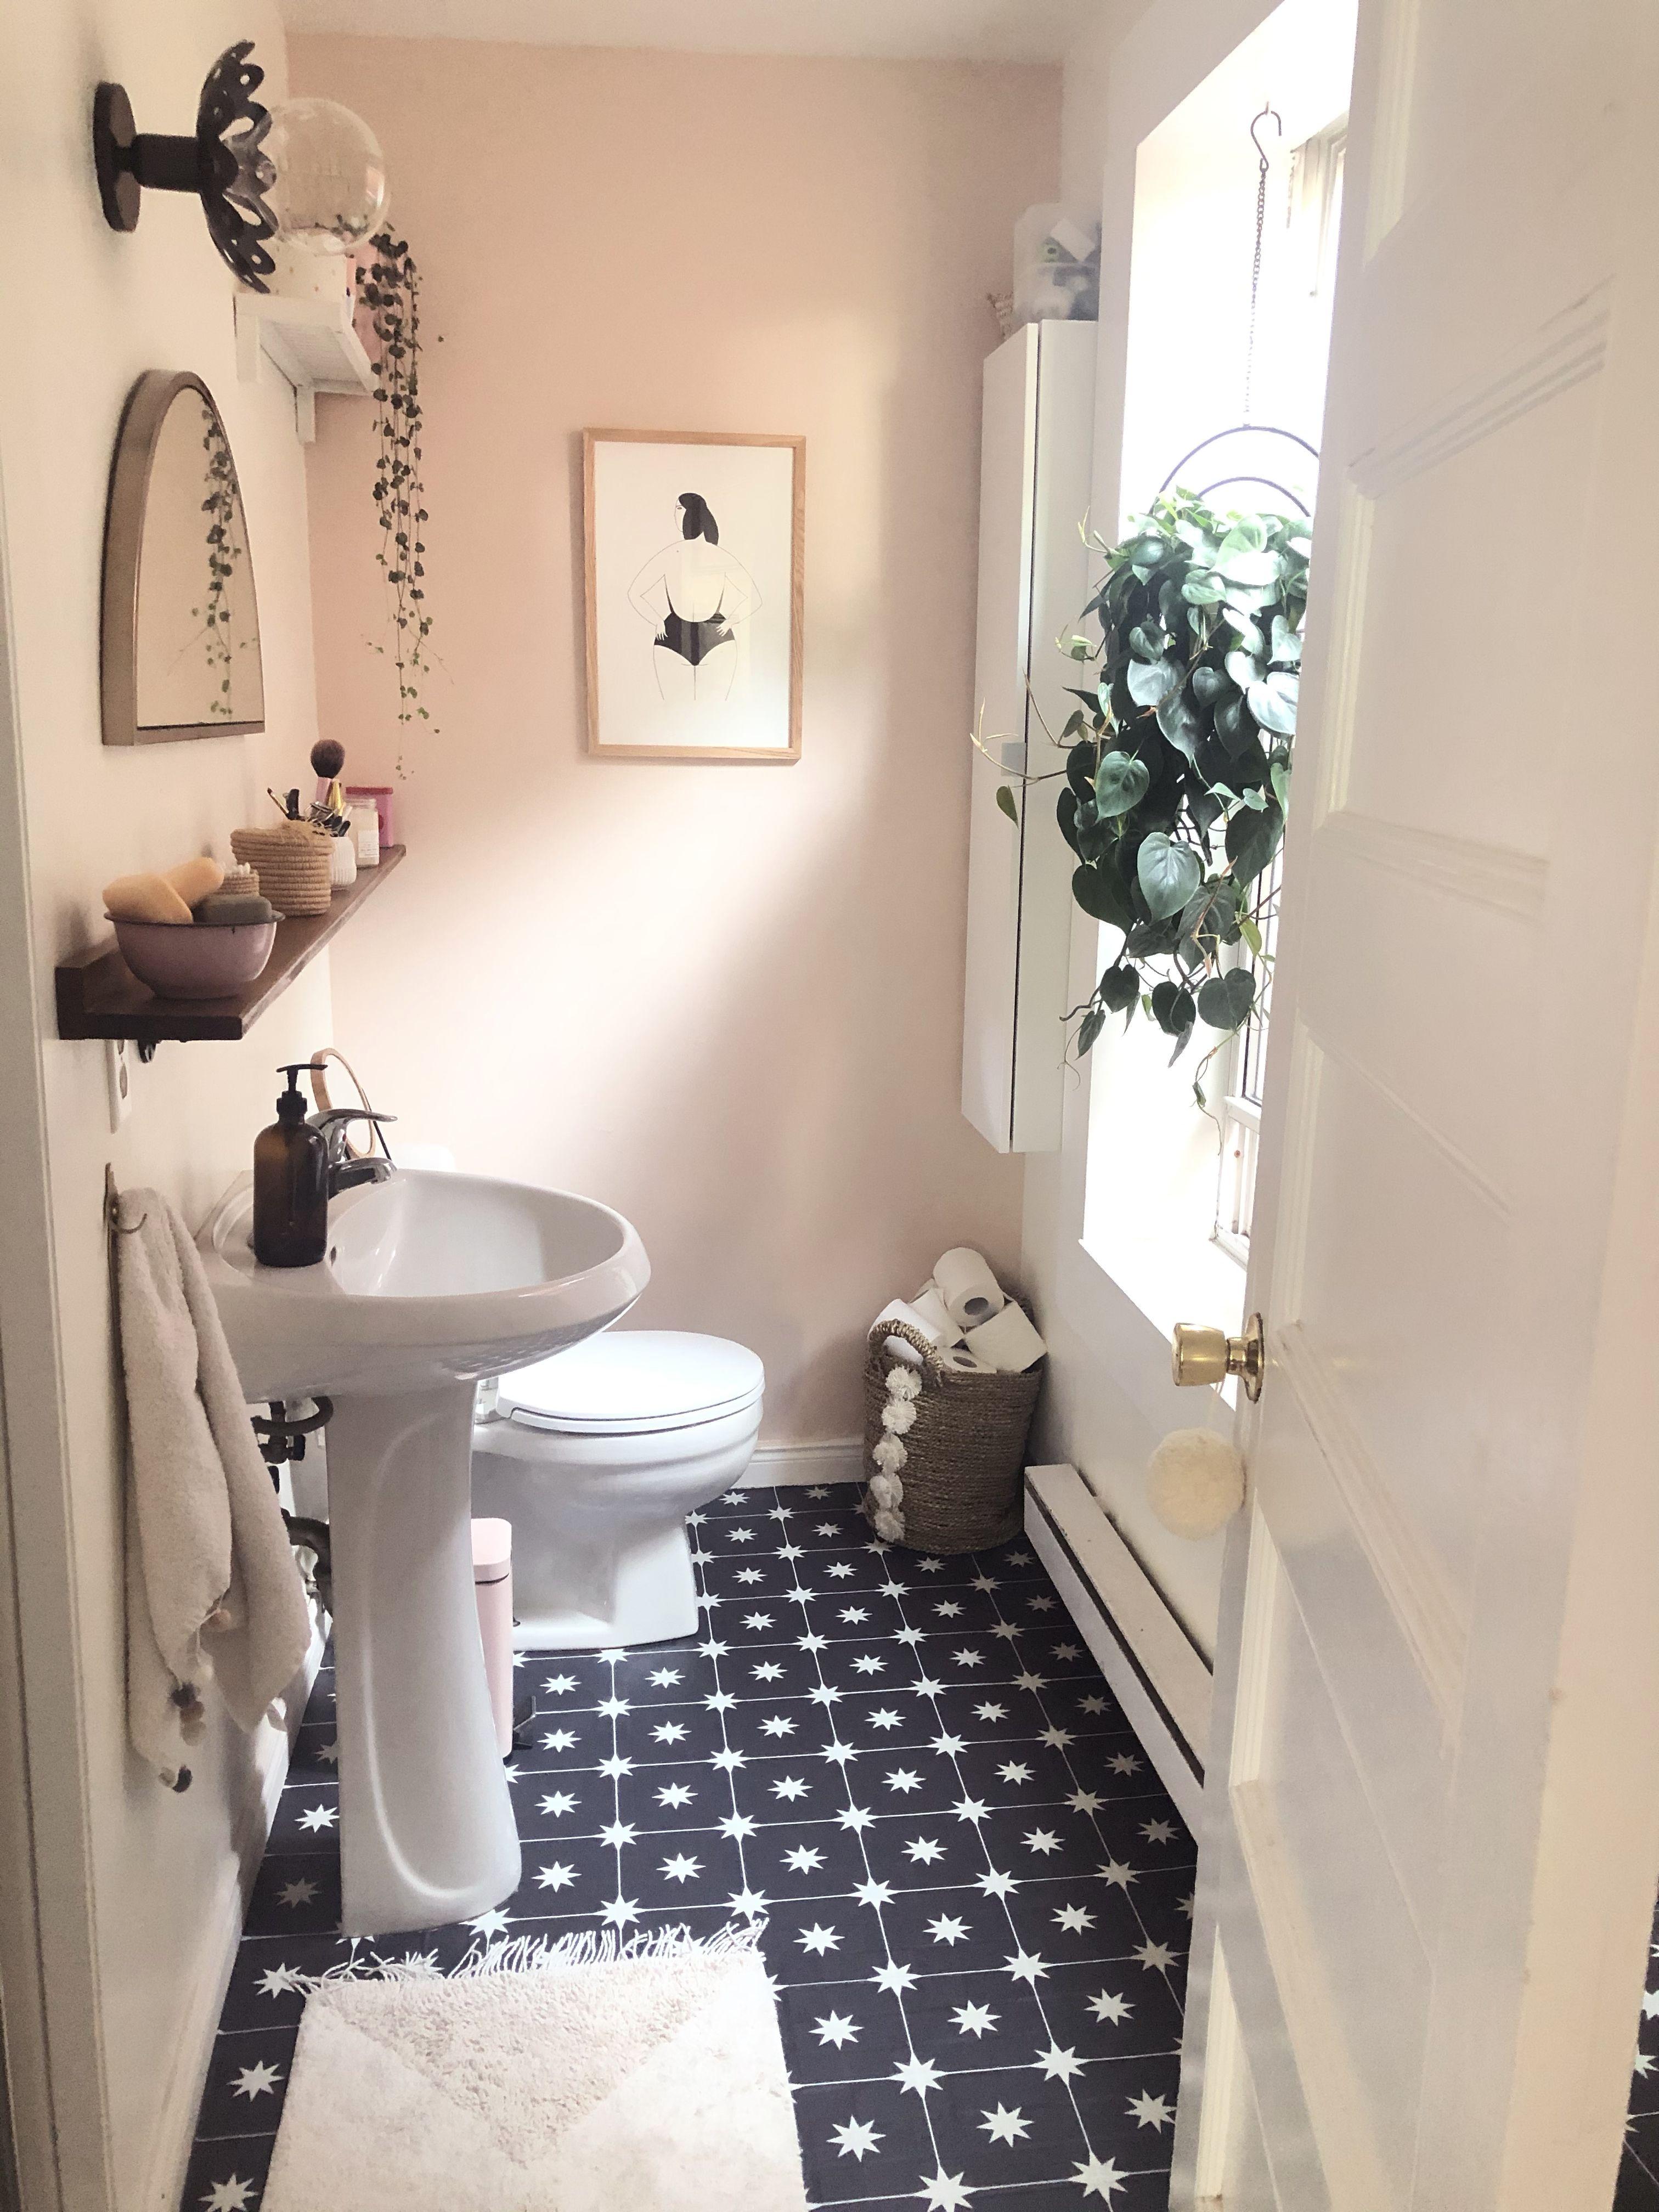 Easy Diy Bathroom Floor Tile Makeover For Under 300 In 2020 Bathroom Flooring Tile Floor Diy Apartment Decor Inspiration